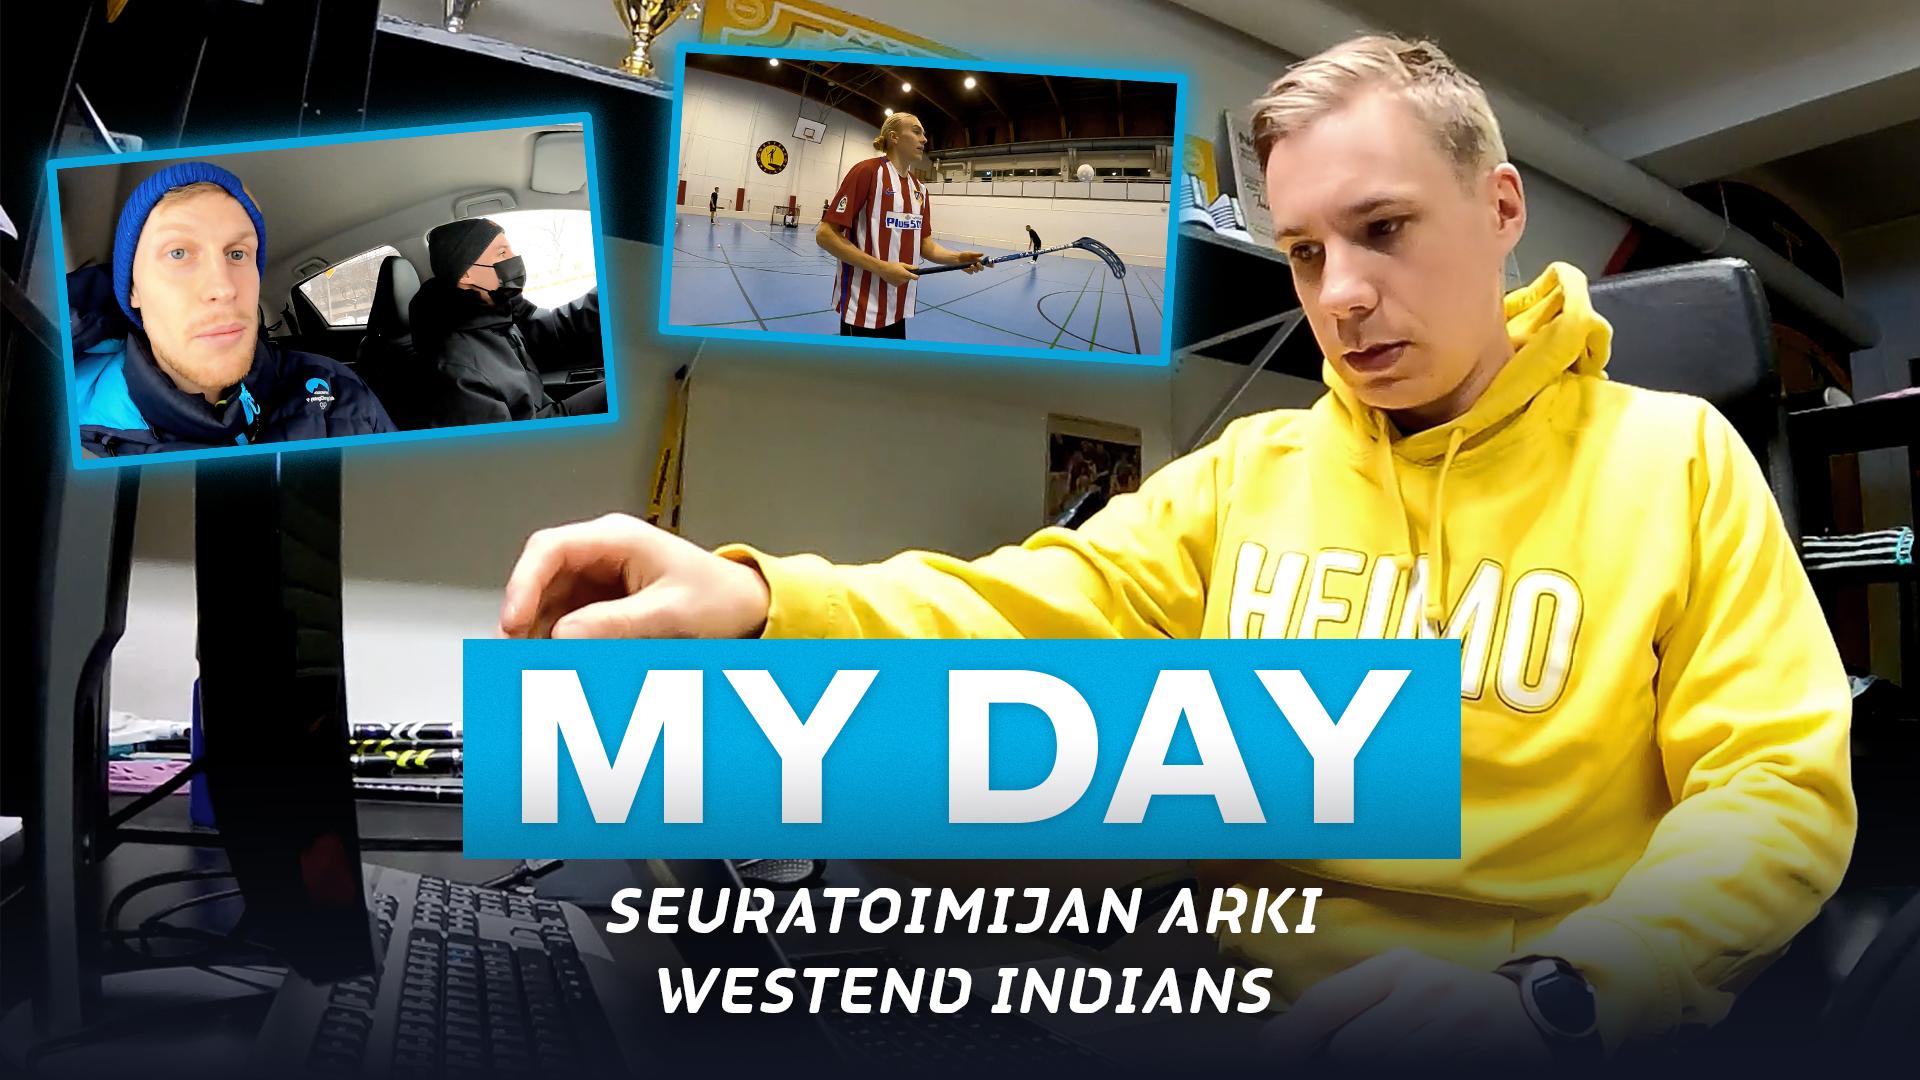 Juha Seppä My Day